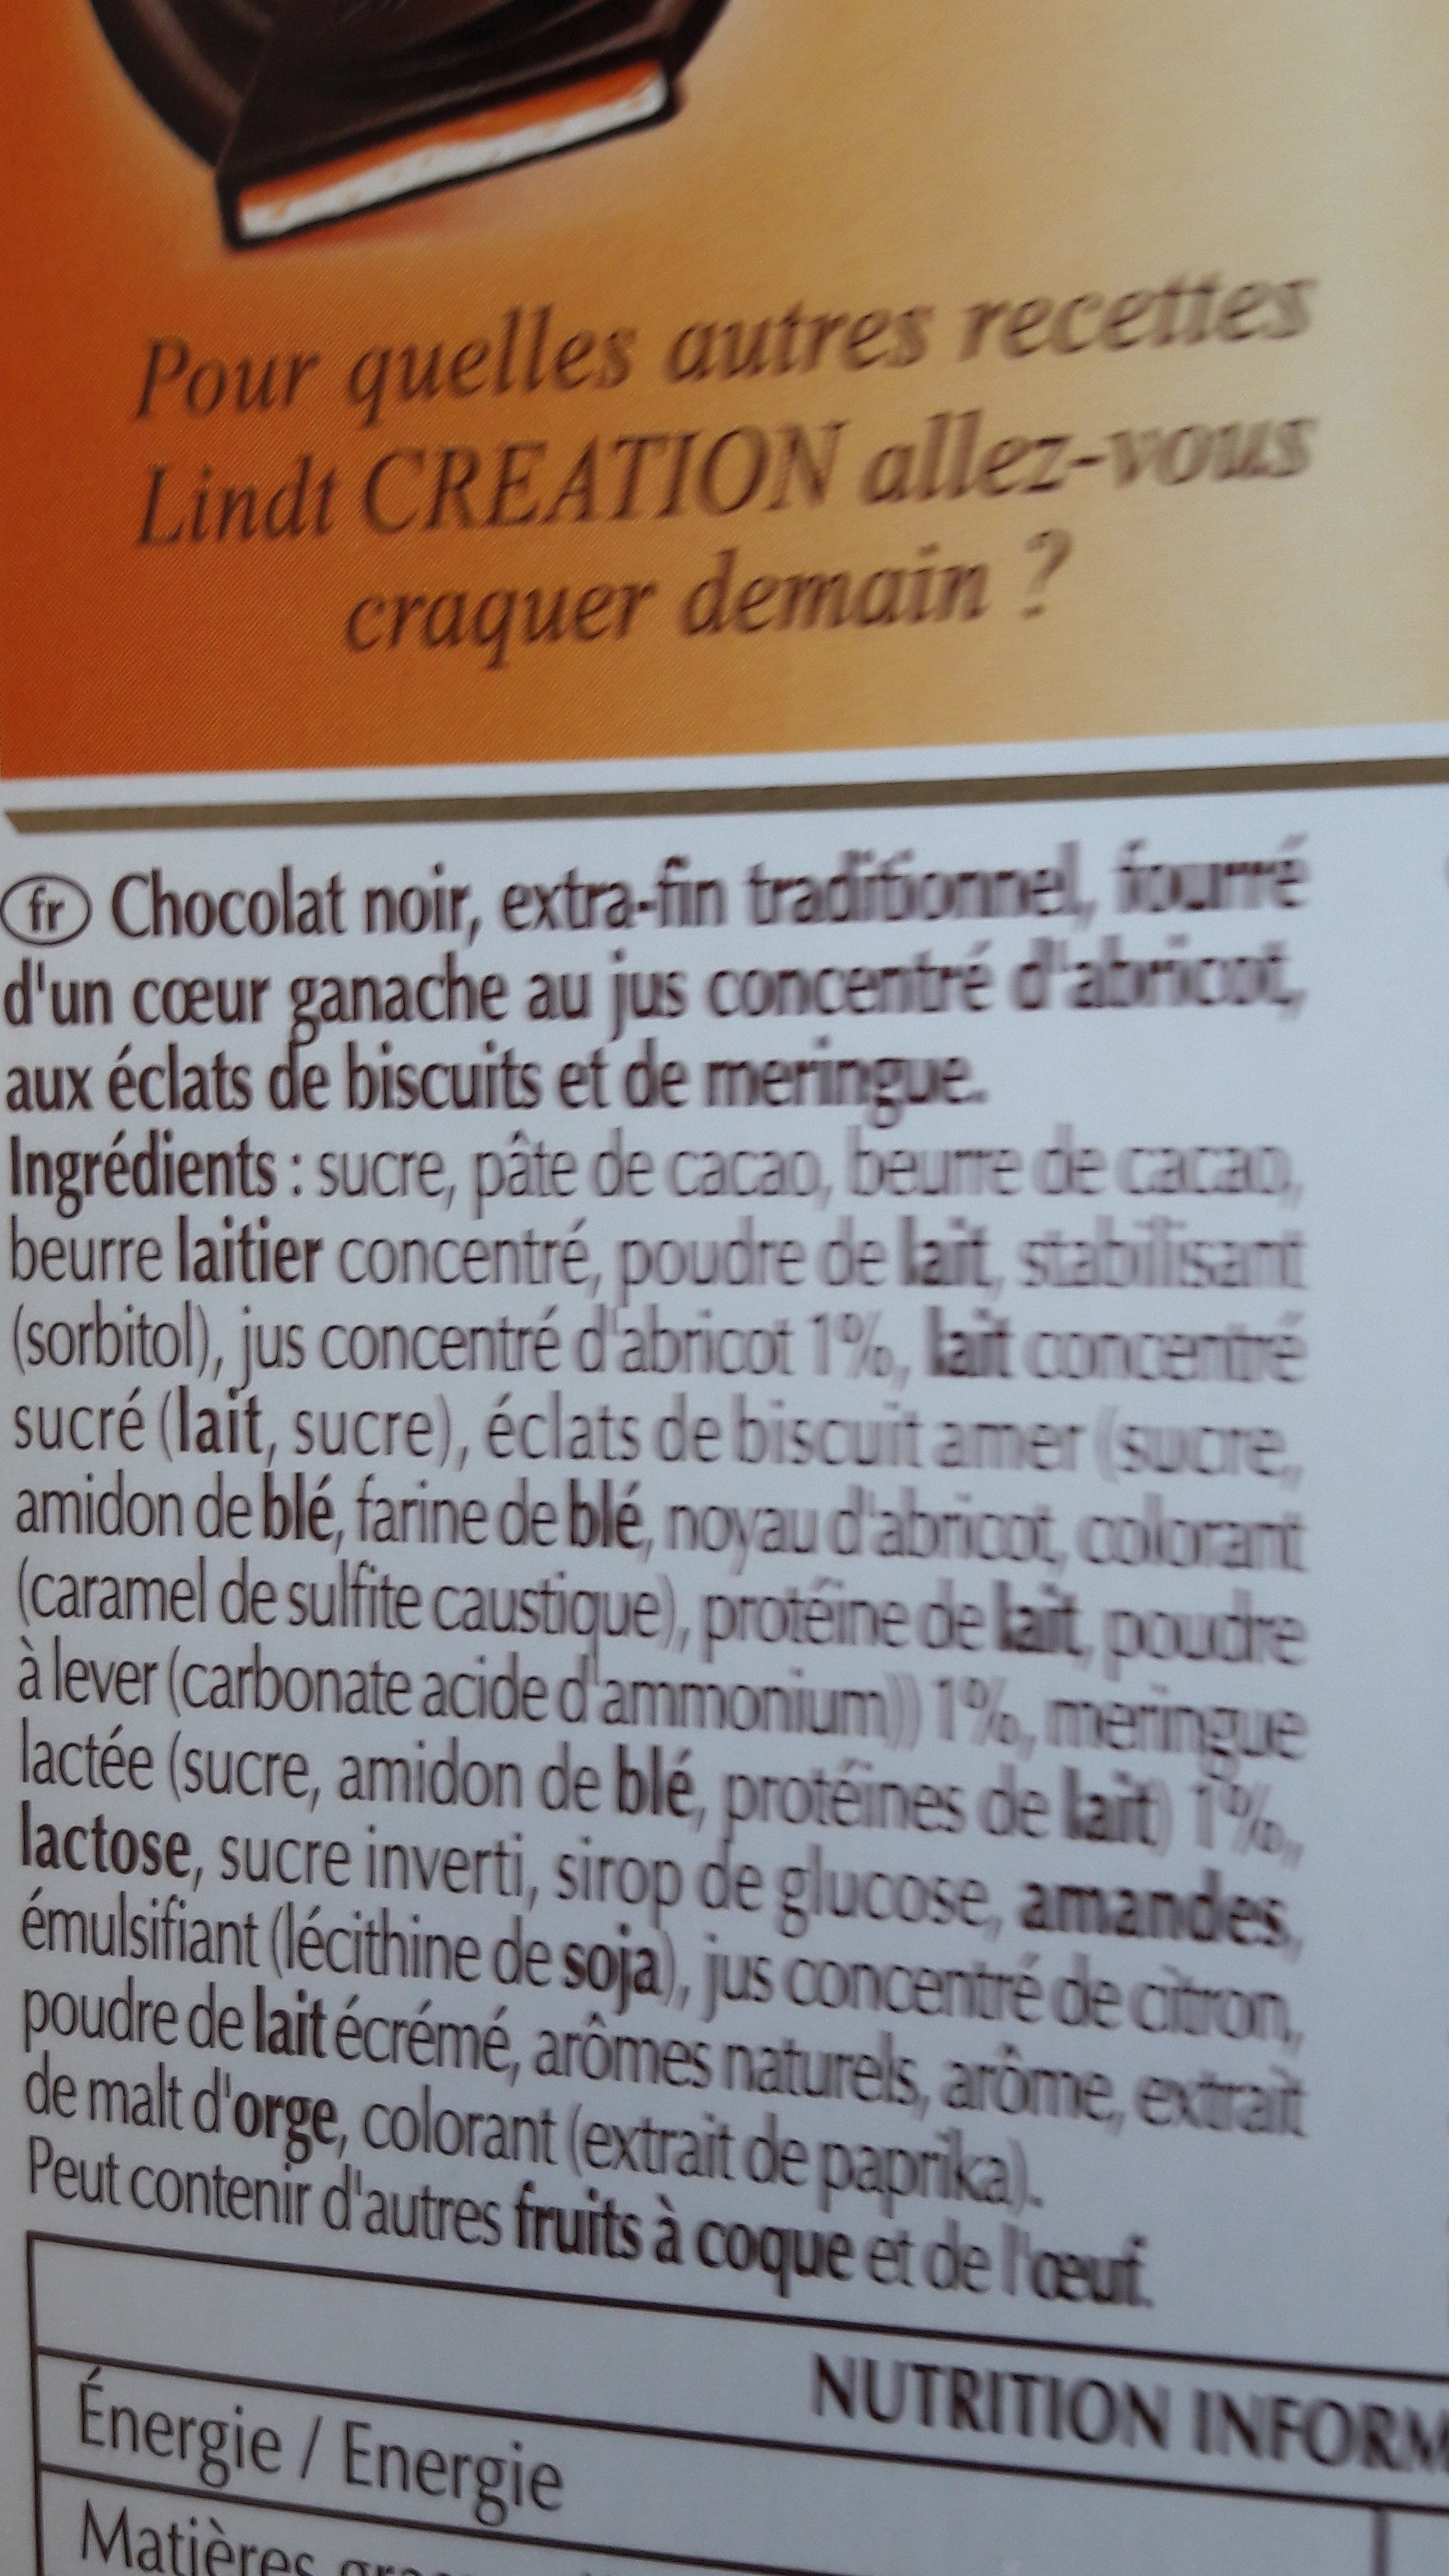 Lindt creation les macarons noir abricot - Ingrediënten